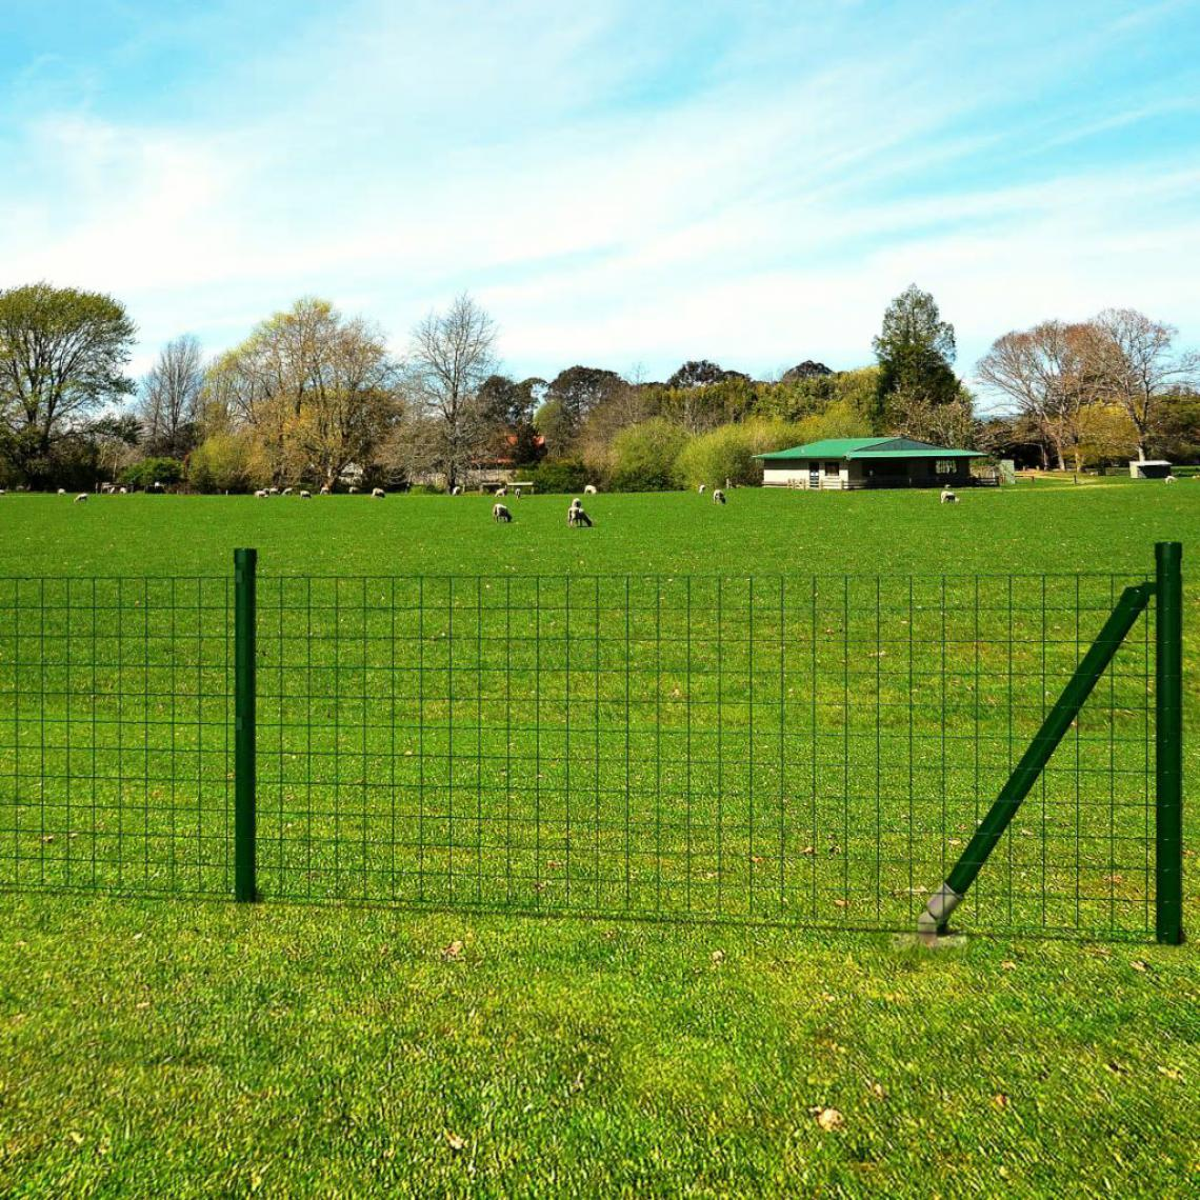 Vidaxl Jeu de clôture avec des piquets de sol 10 x 0,8 m Acier Vert - Vert